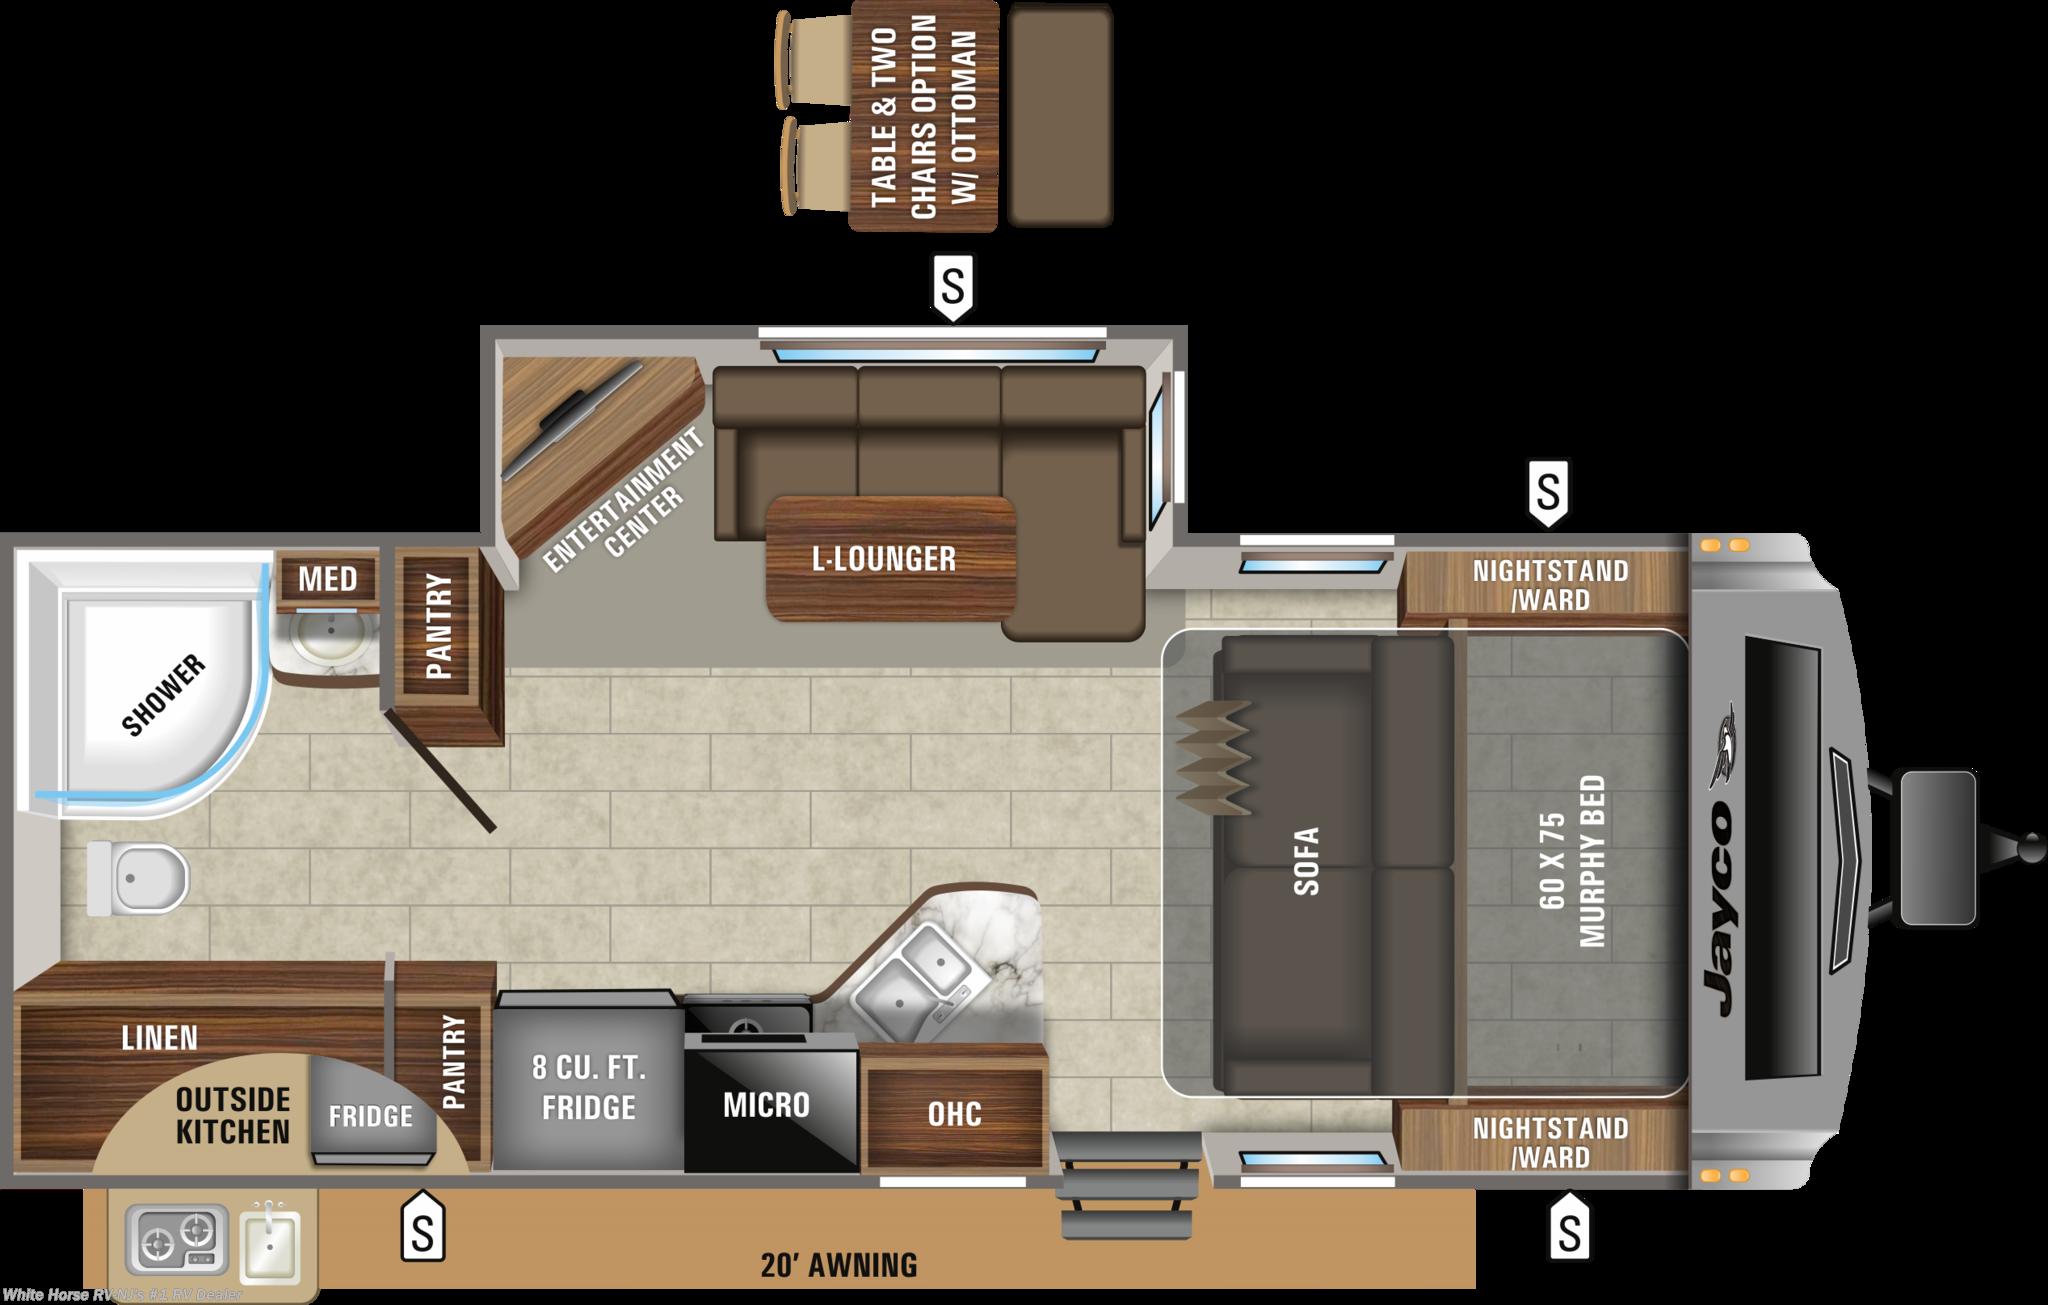 2020 Jayco White Hawk 23mrb Murphy Bed W Rear Bath L Dinette Slideout Rv For Sale In Williamstown Nj 08094 Wh12793 Rvusa Com Classifieds